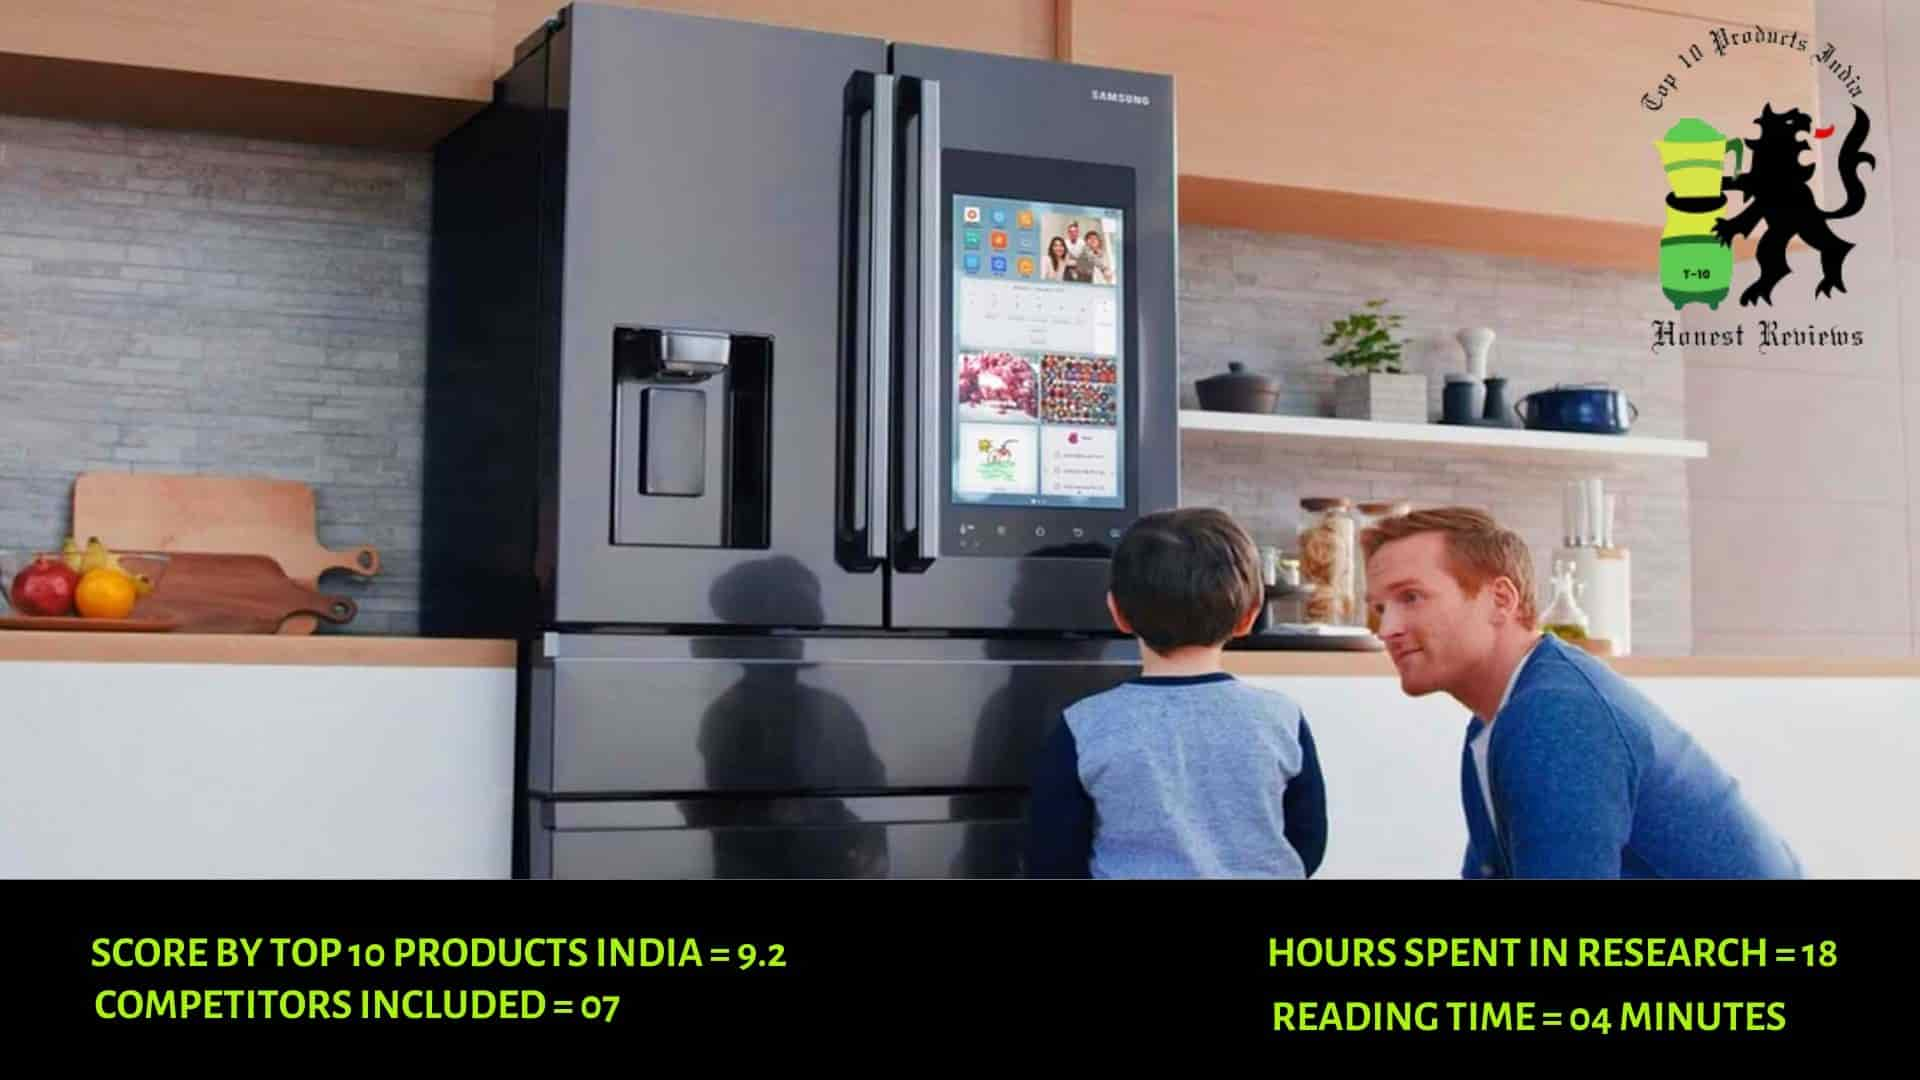 LG Refrigerator Single Door Review 2021